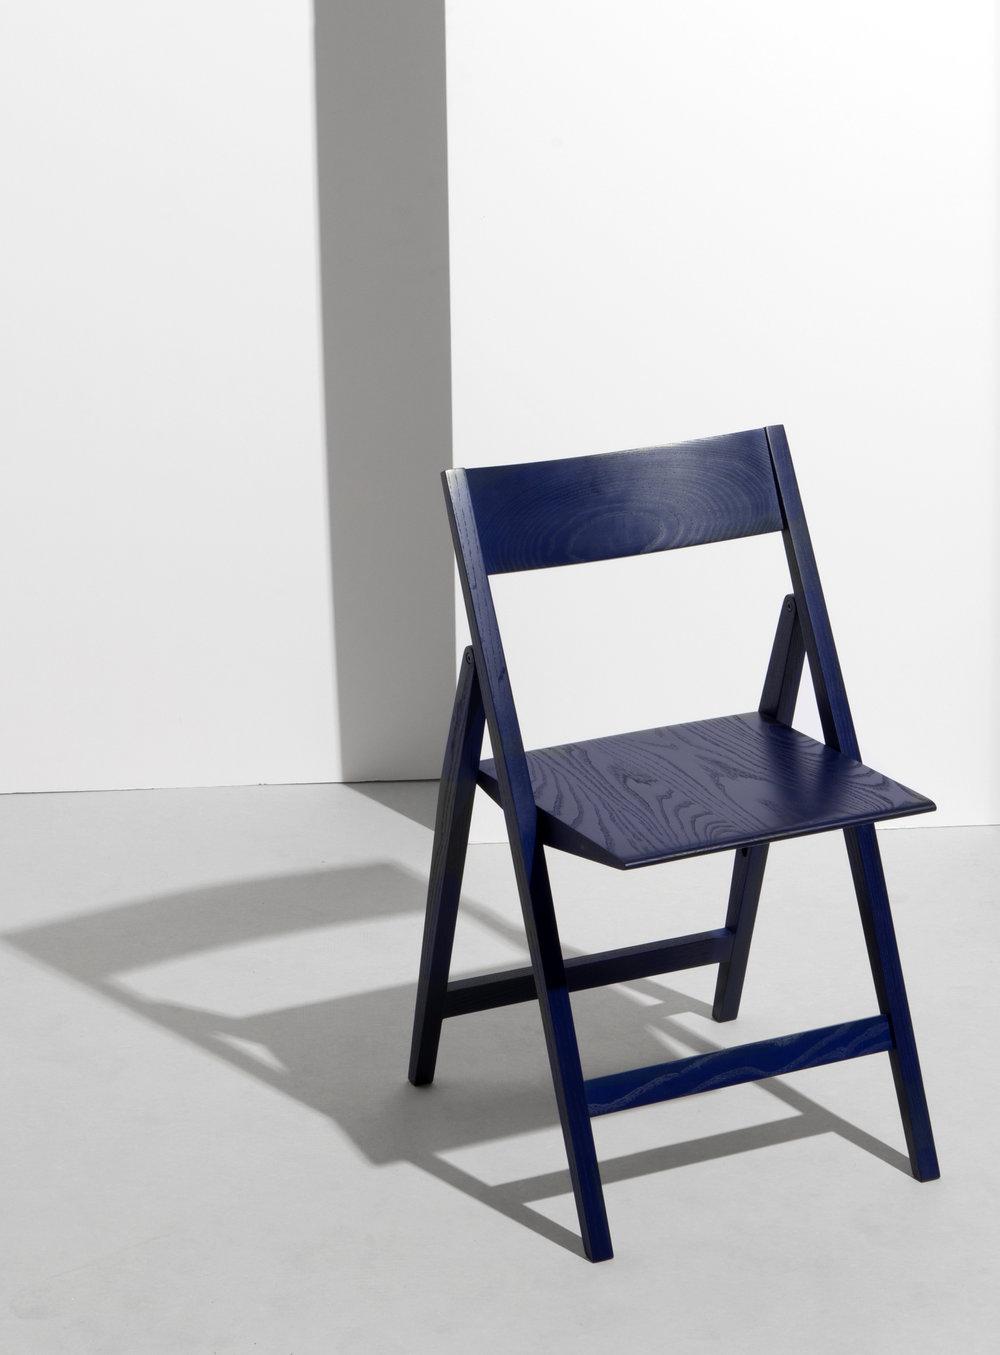 Gabriel Tan_Compass folding chair 4.jpg